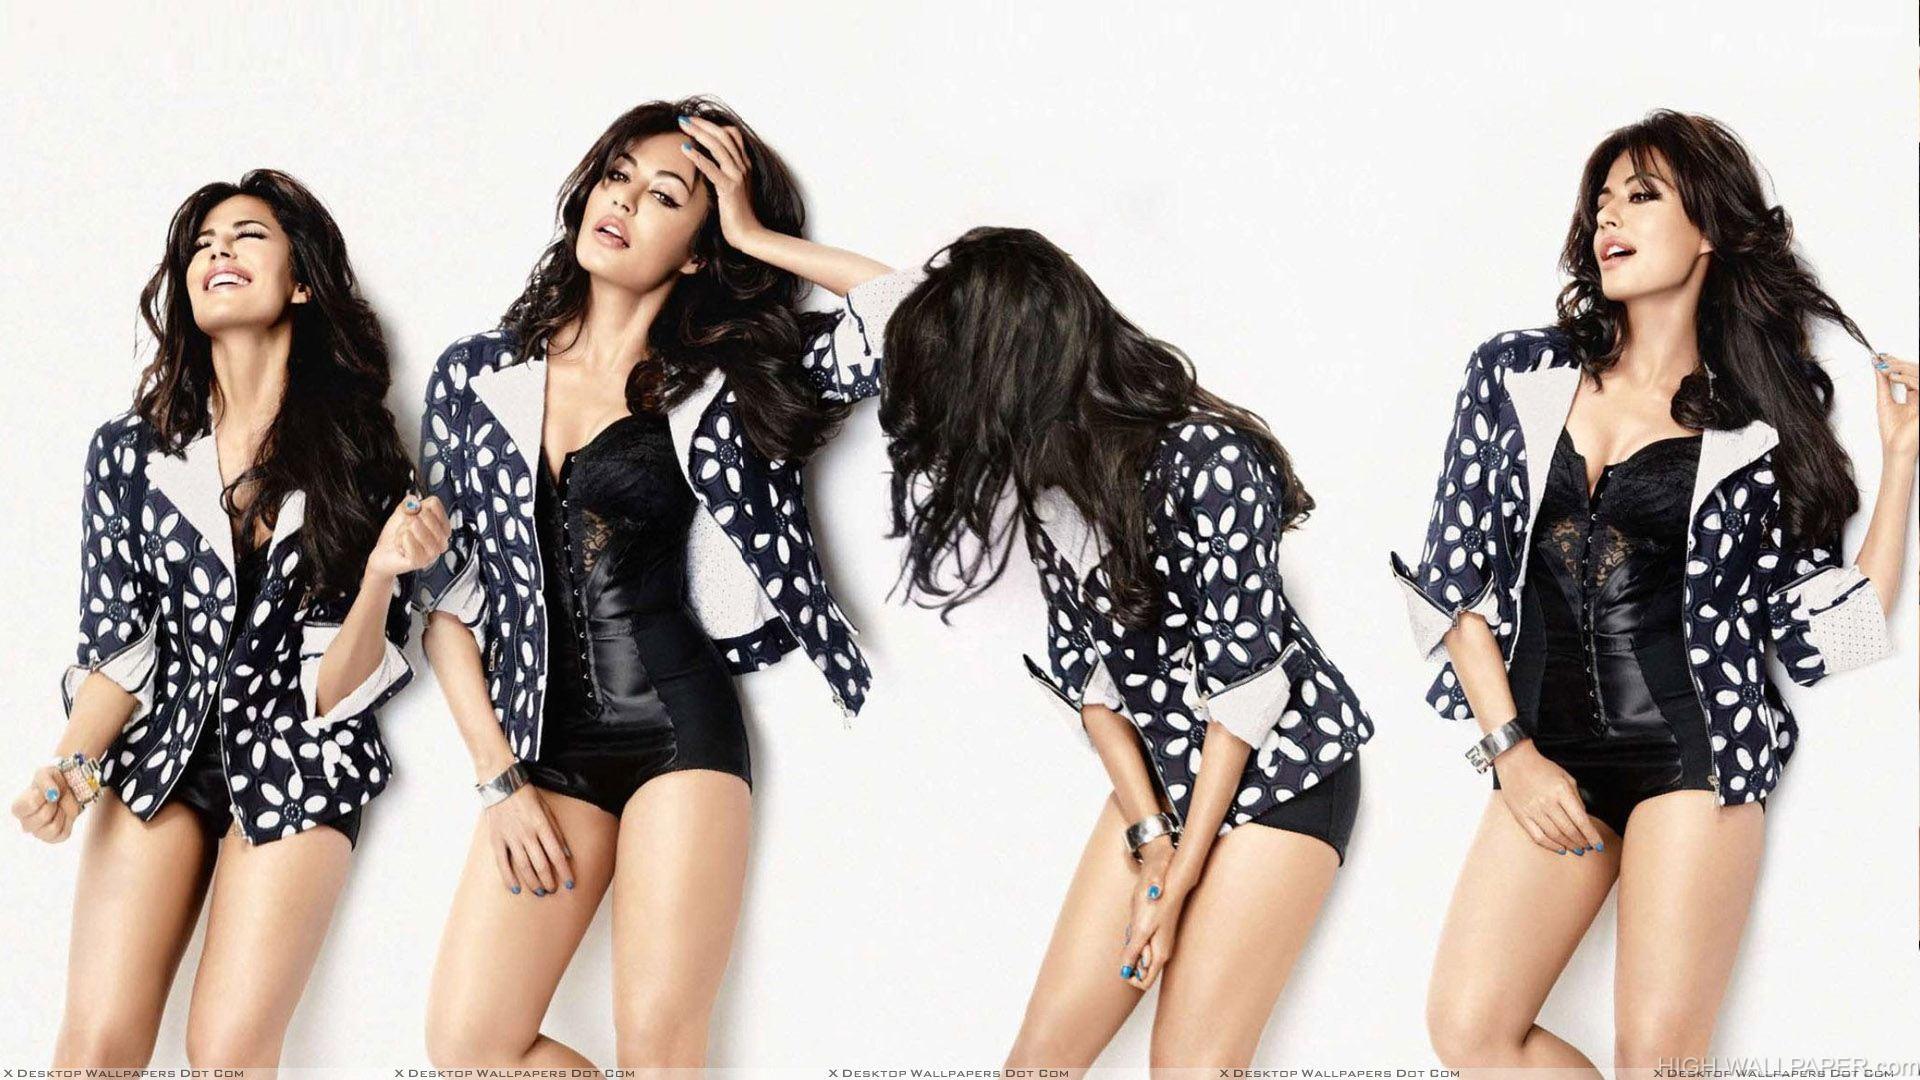 Chitrangada Singh In Black Dress Drefferent Pose Photoshoot